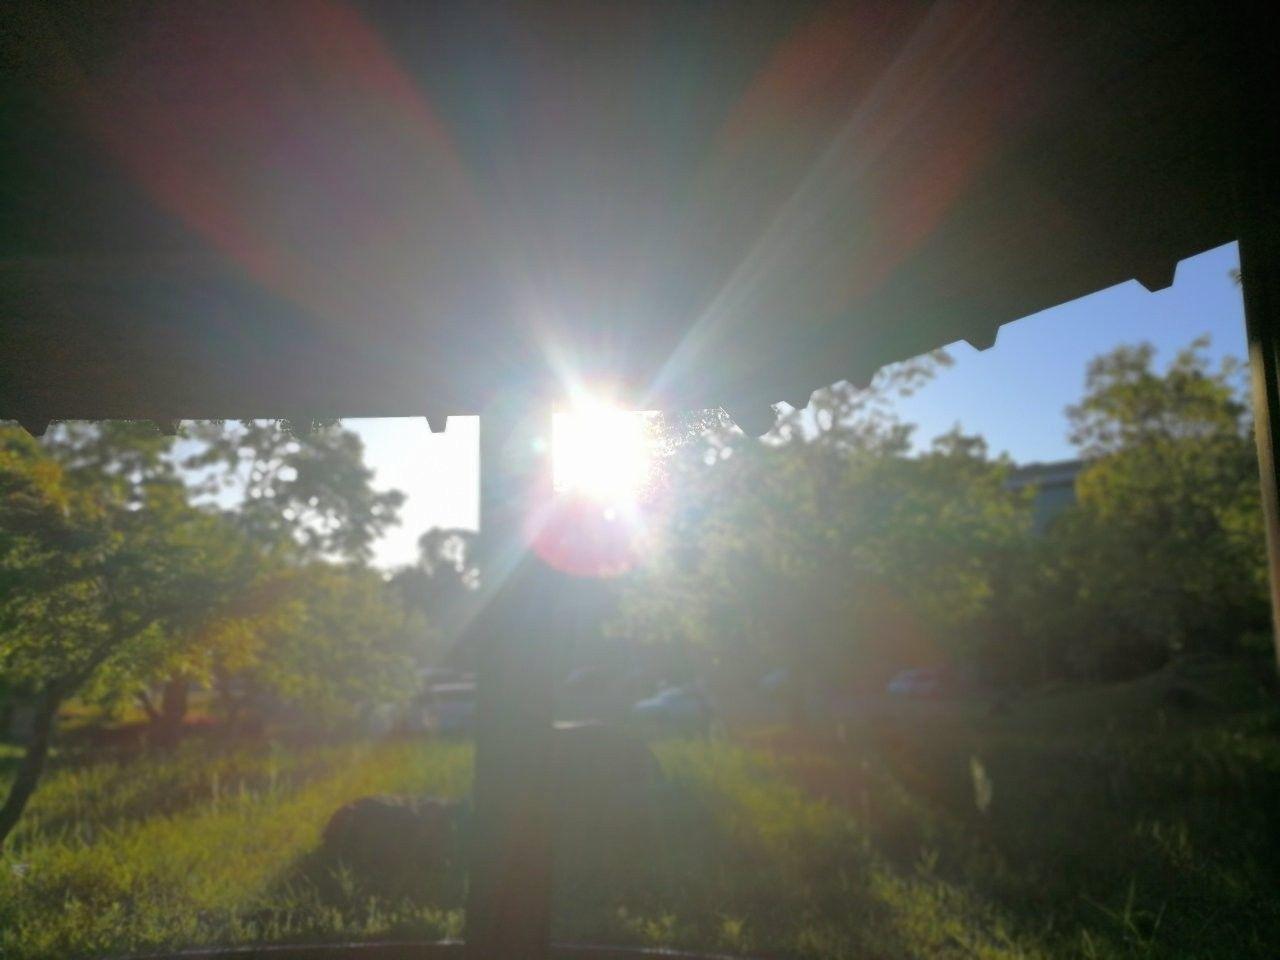 f:id:adagio-nijiiro:20190428010209j:image